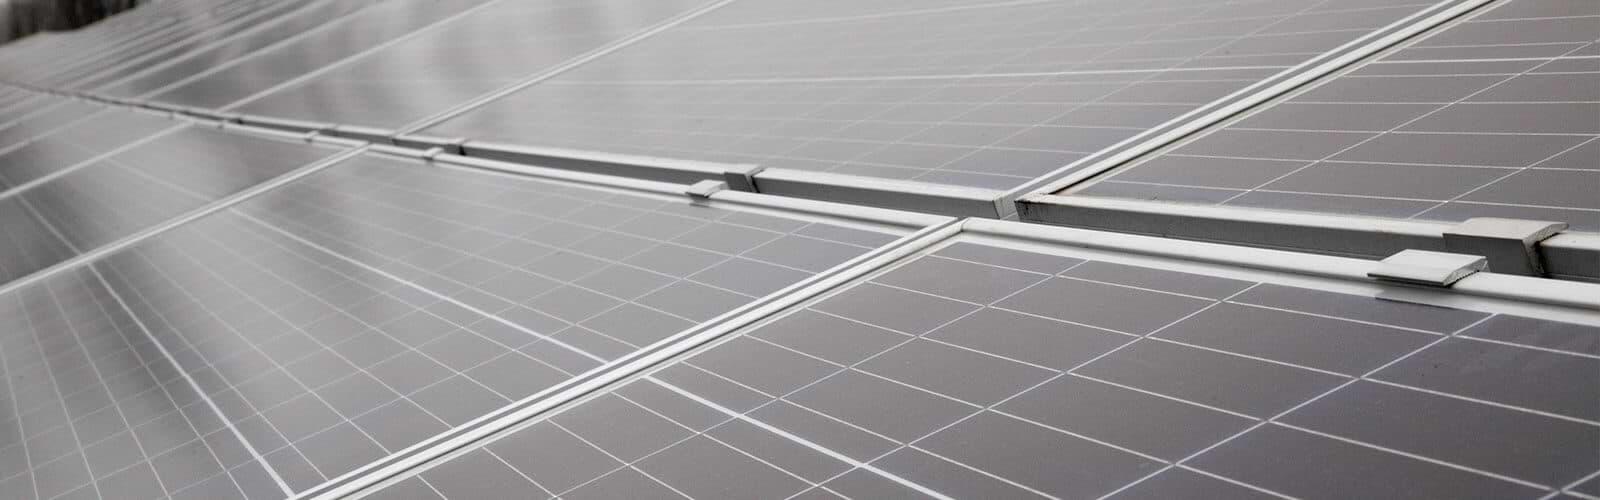 solar charging batteries